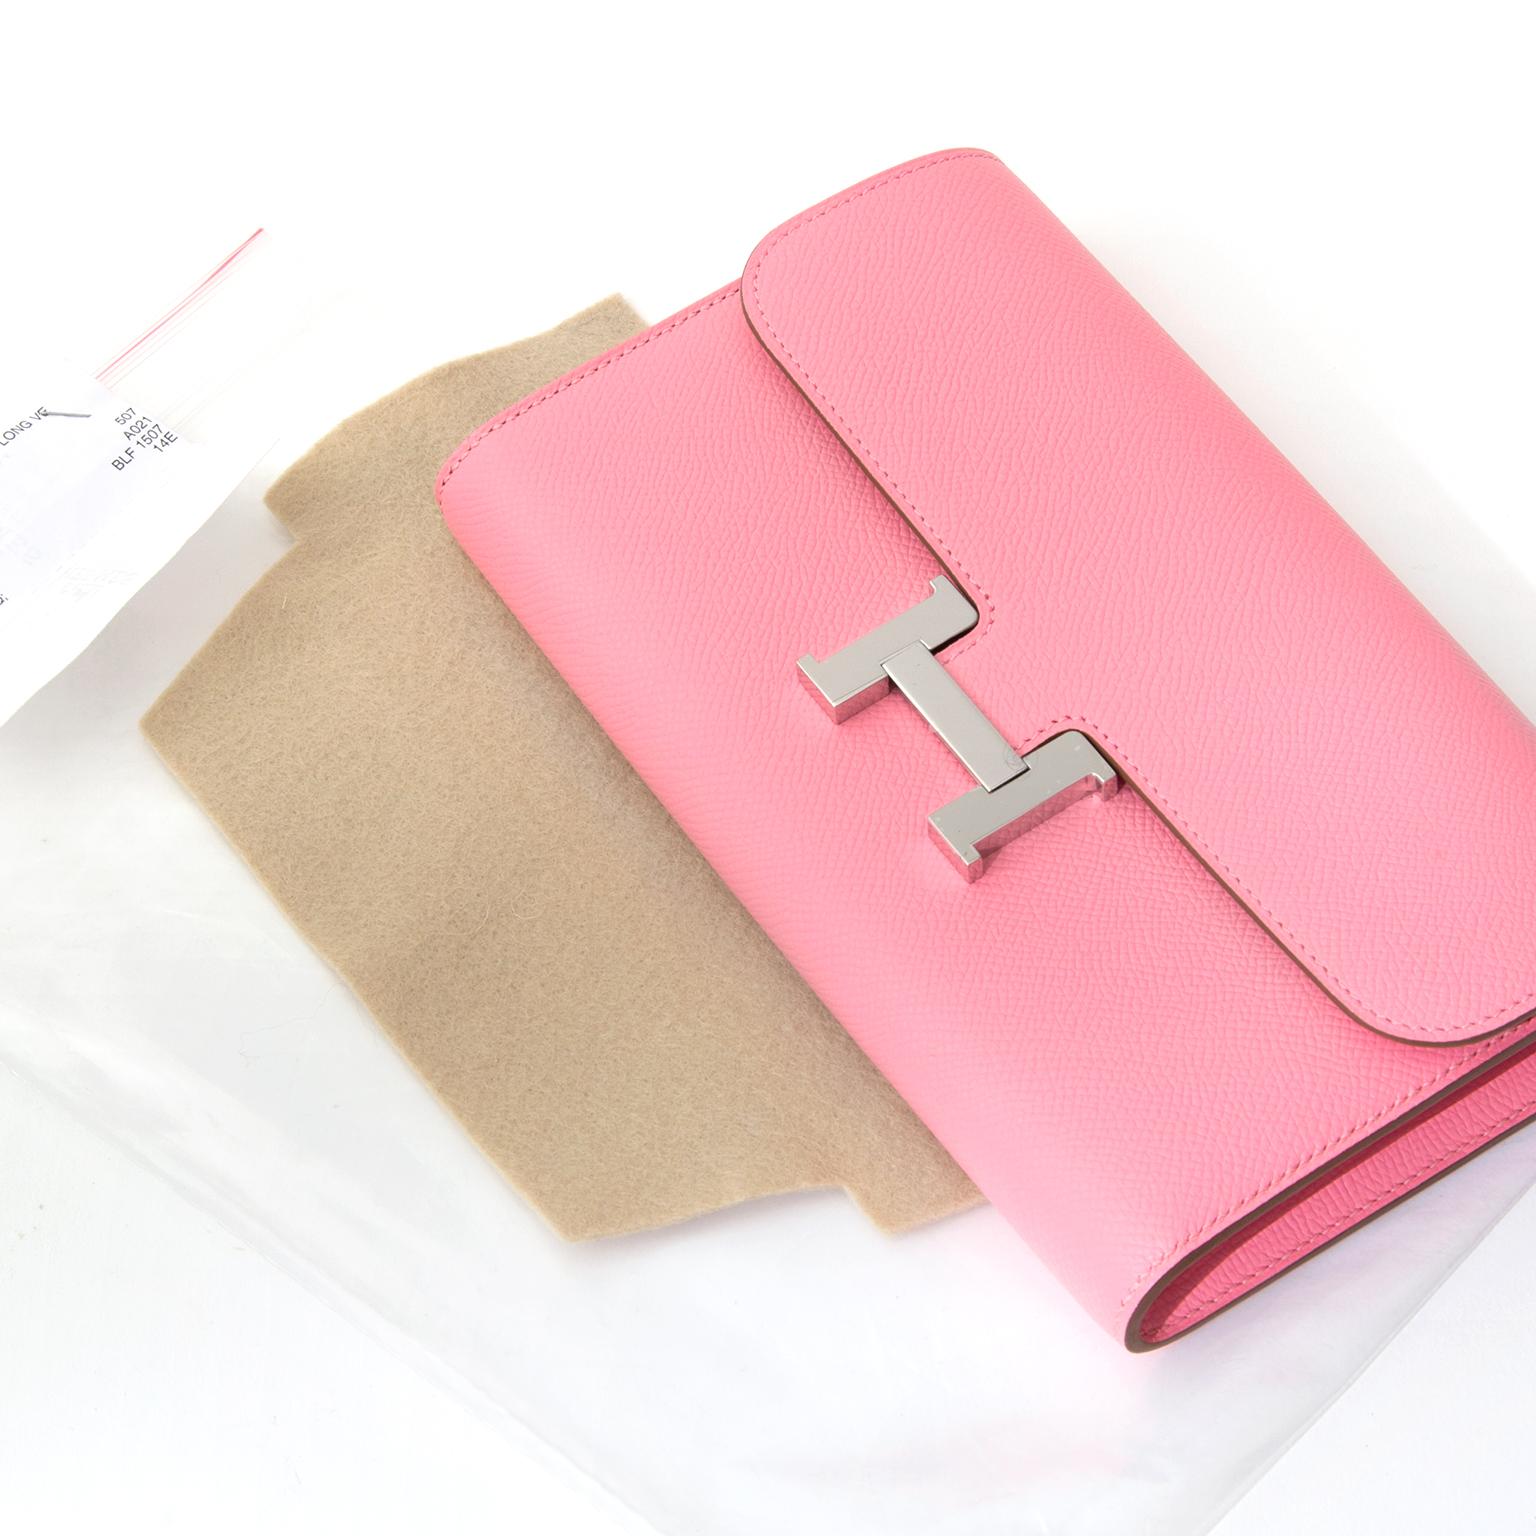 f90bdac3ccad ... Shop safe online brand new BRAND NEW Hermes Constance Long Wallet Veau  Epsom Rose Confetti online